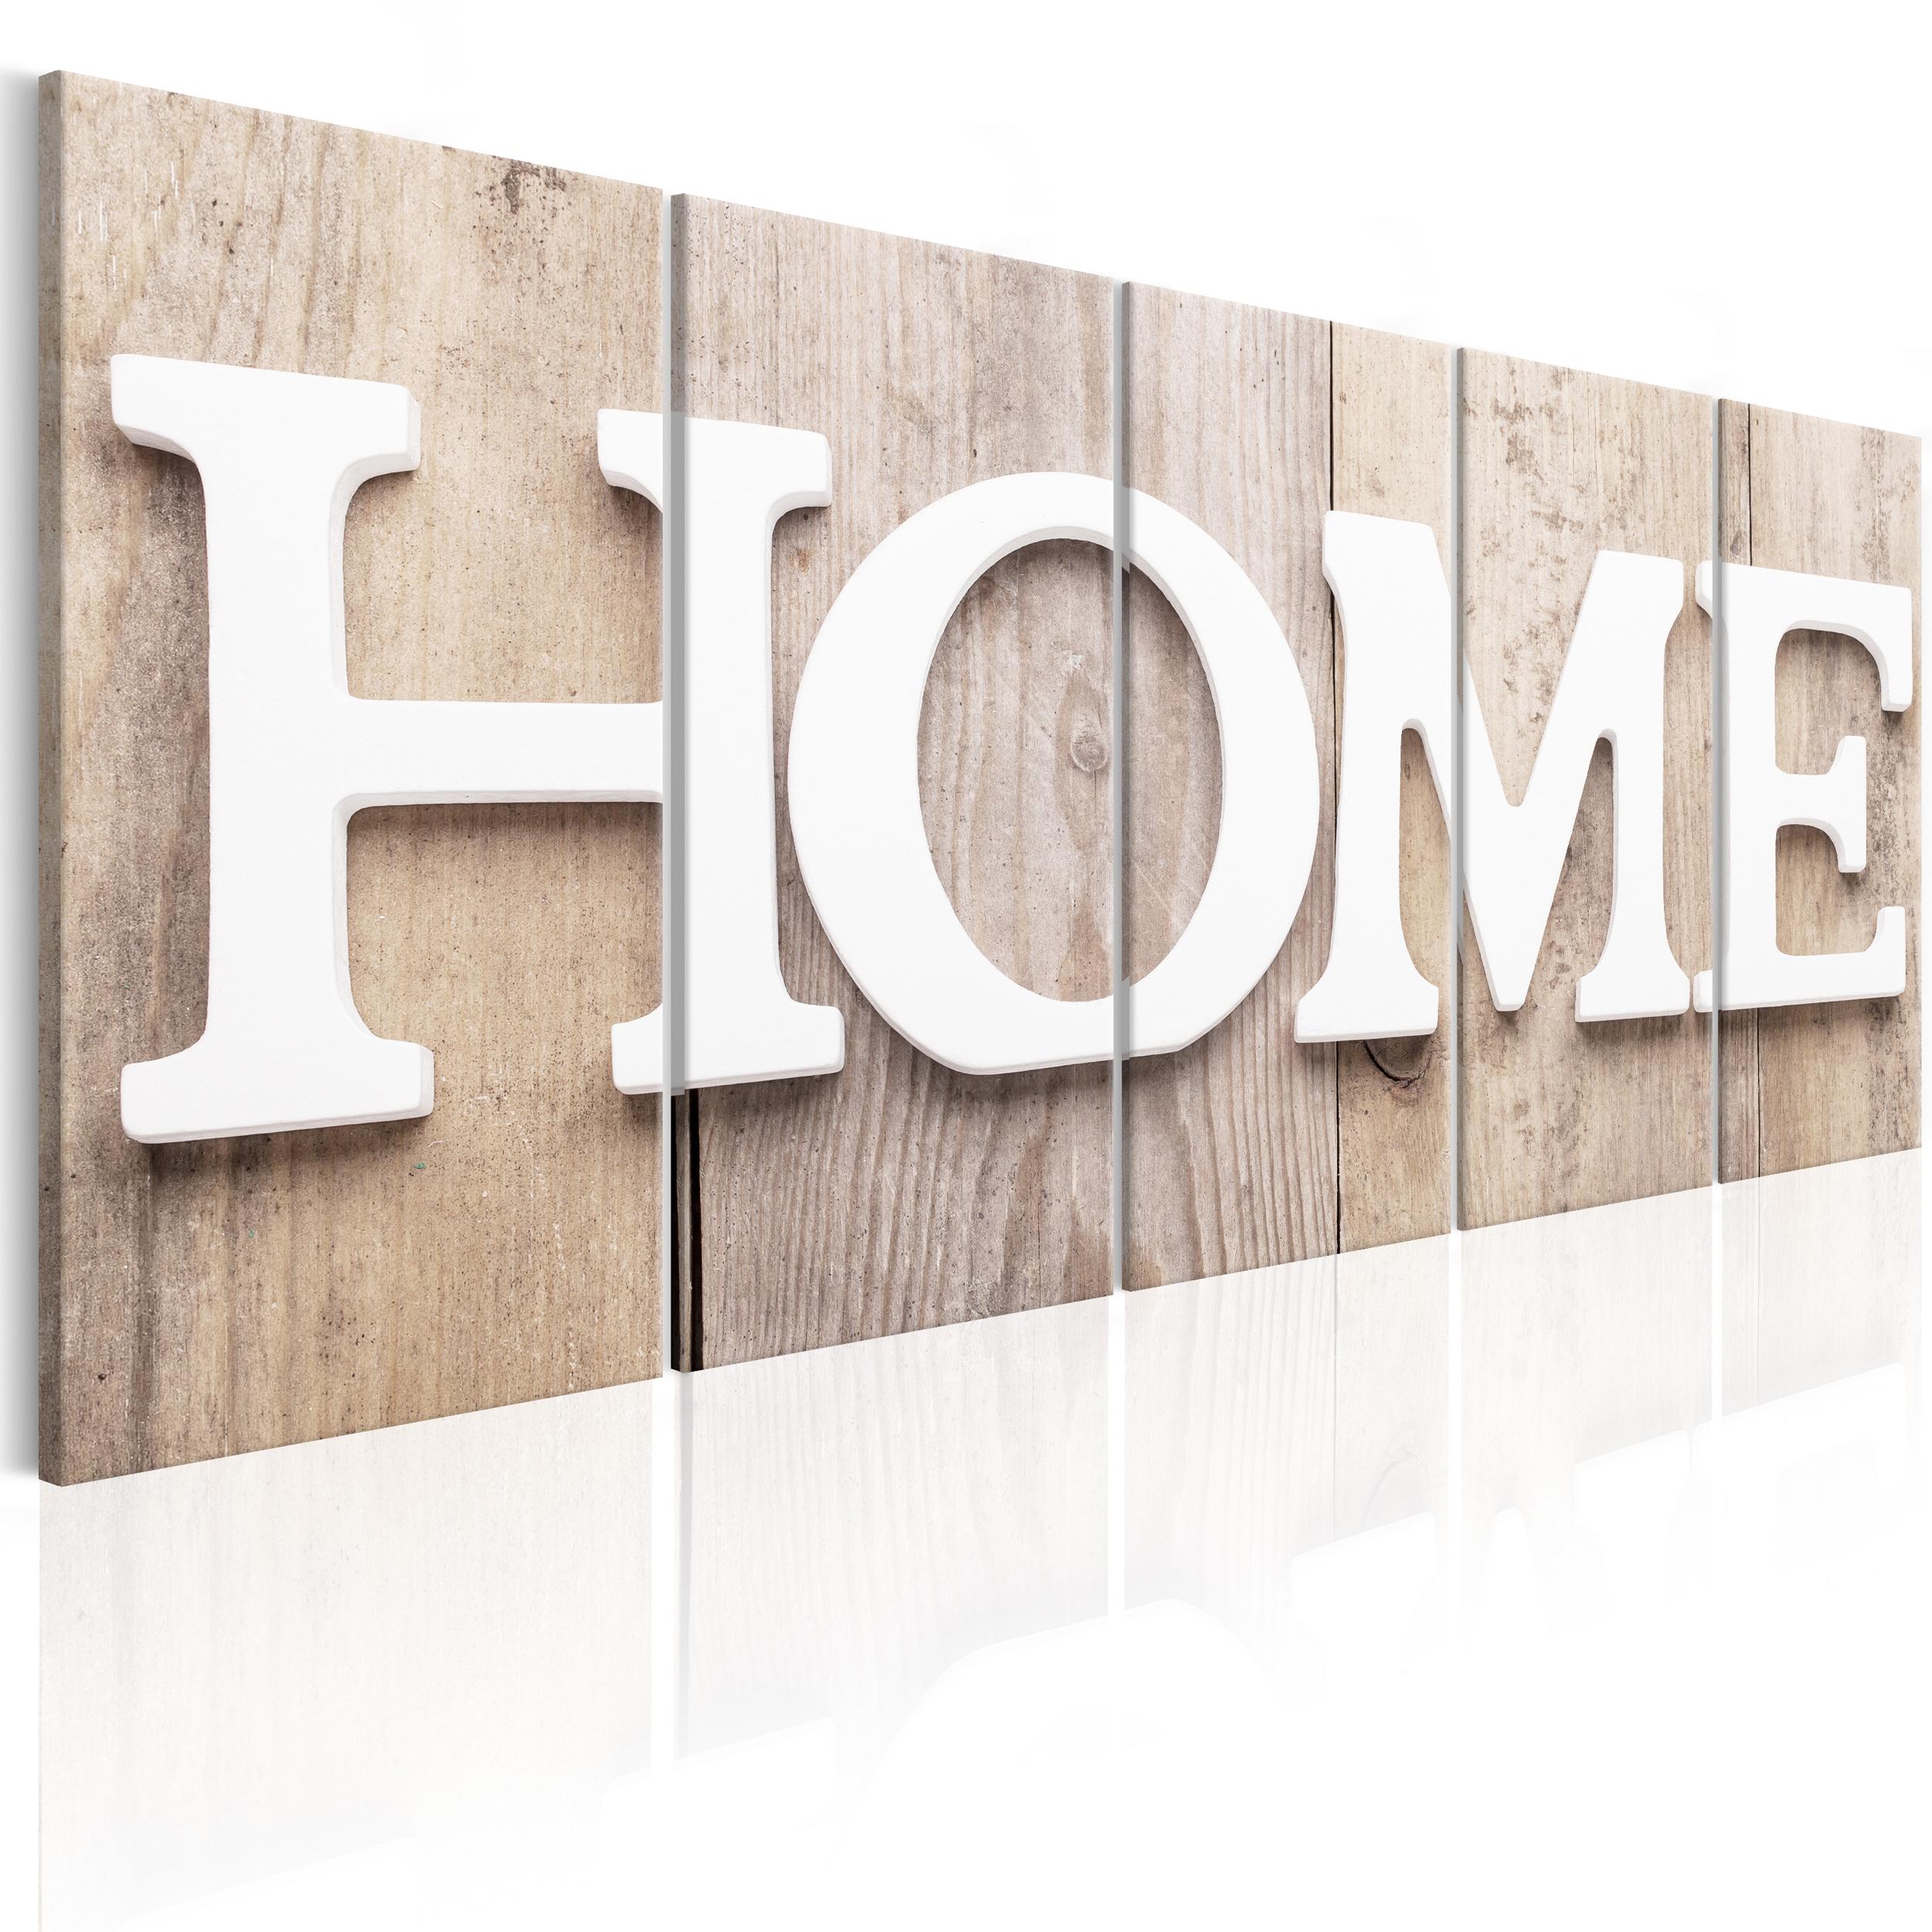 bilder leinwand bild home hause retro vintage holz wandbilder kunstdruck ebay. Black Bedroom Furniture Sets. Home Design Ideas